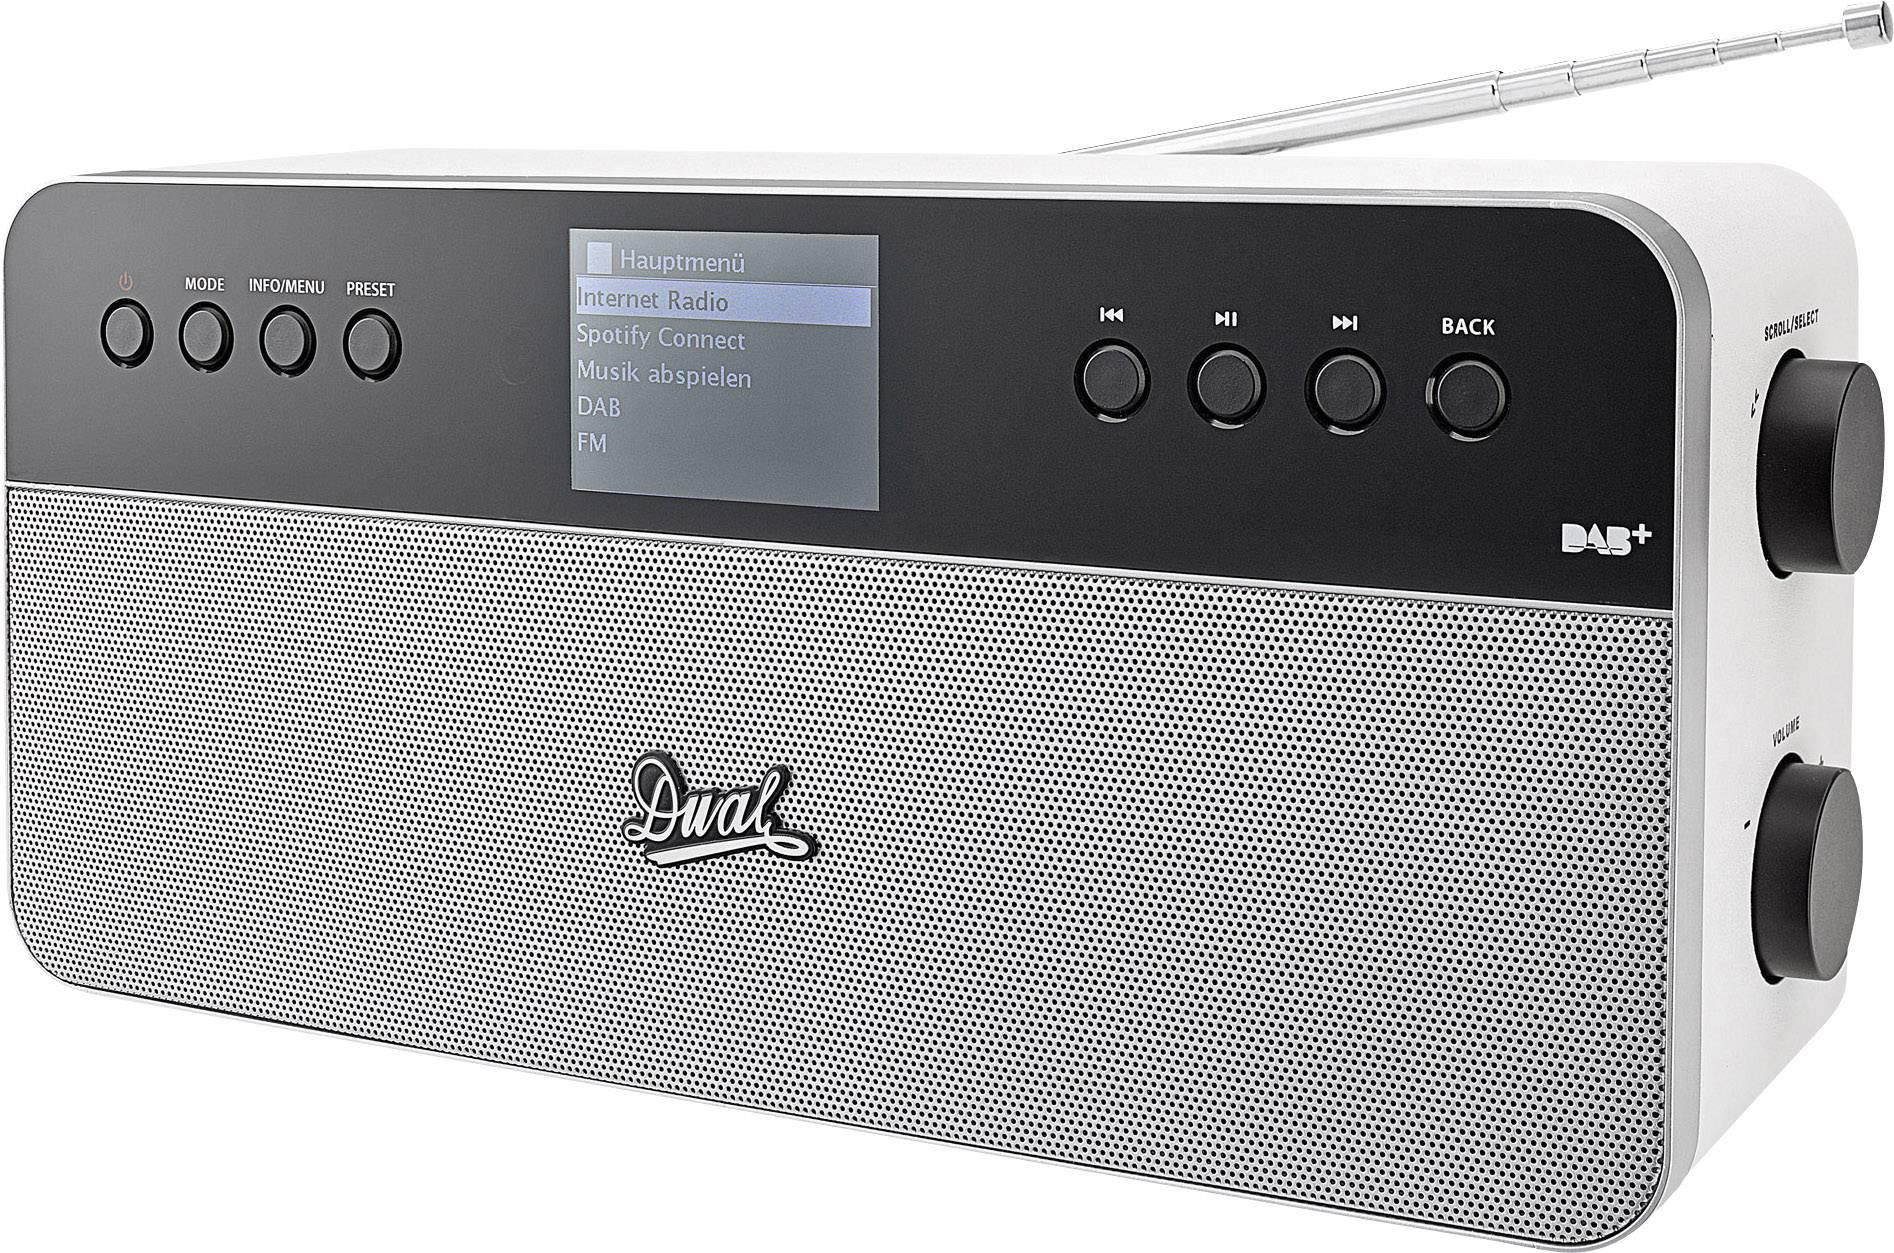 Internetové stolní rádio Dual IR 6S Plus Spotify bílá, stříbrná